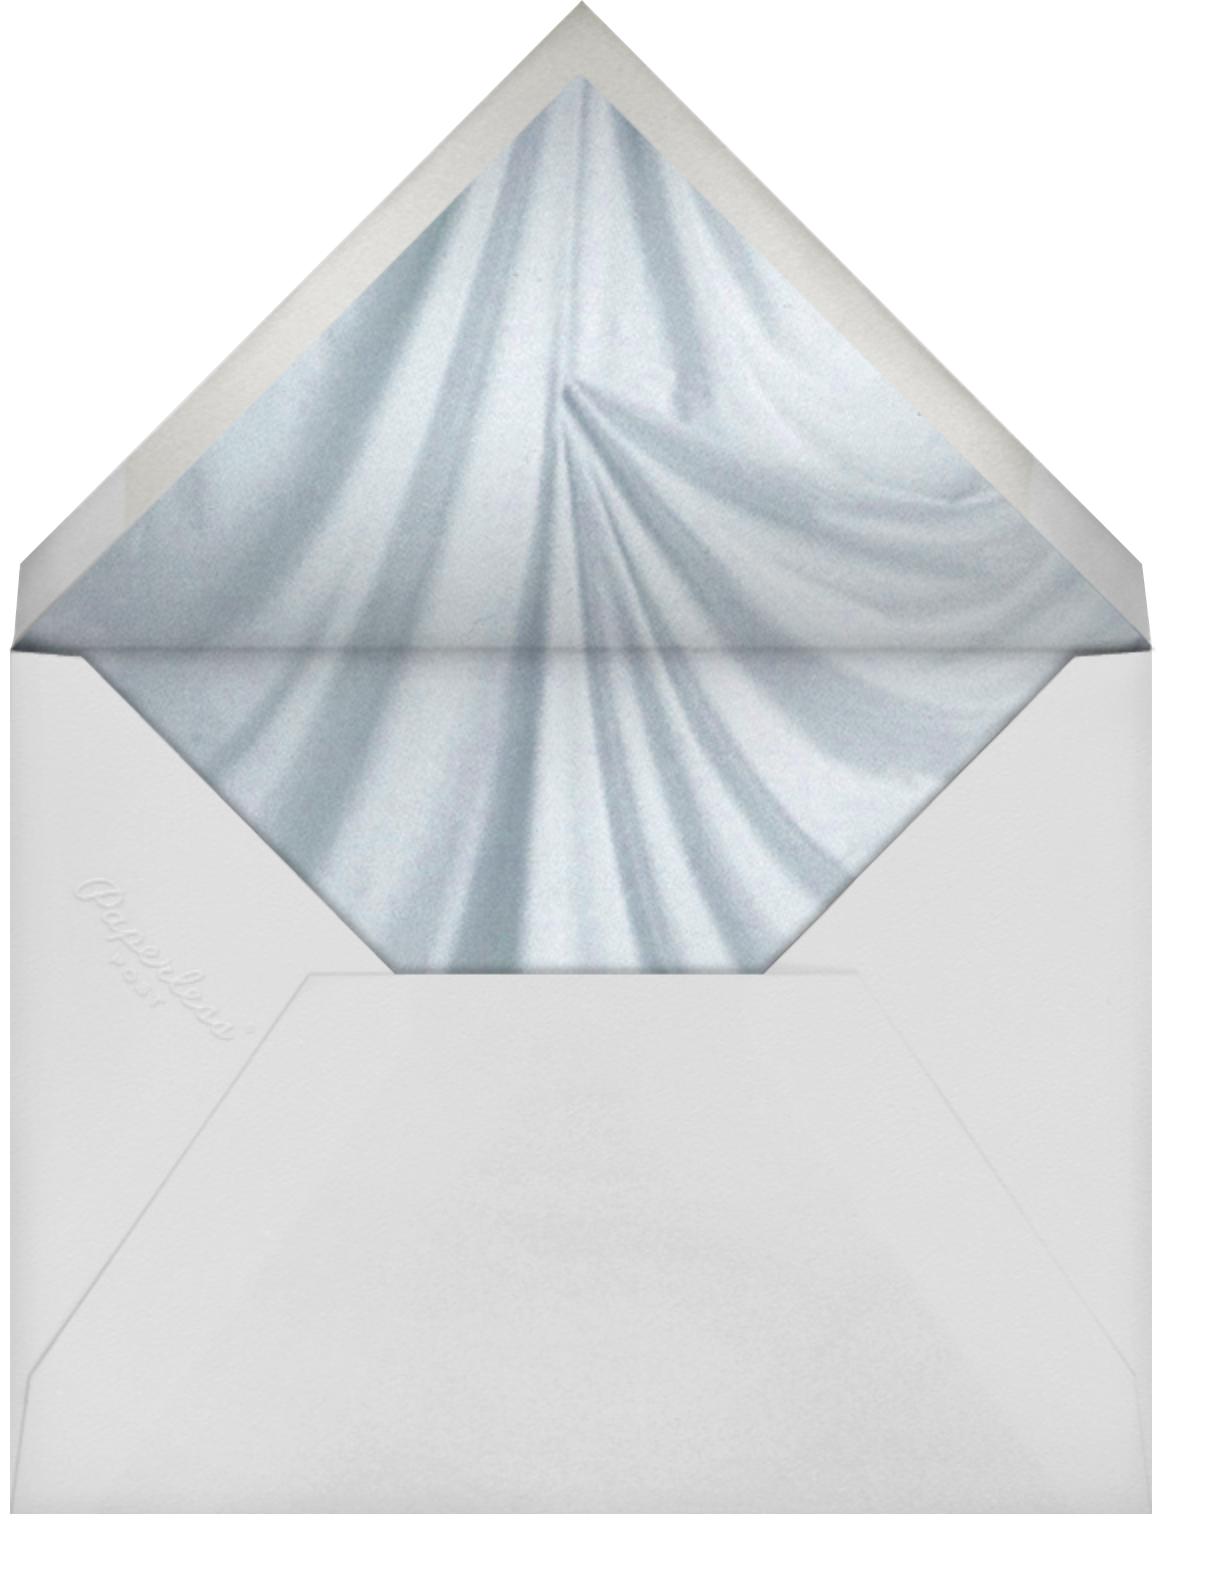 Nebula - Kelly Wearstler - Printable invitations - envelope back